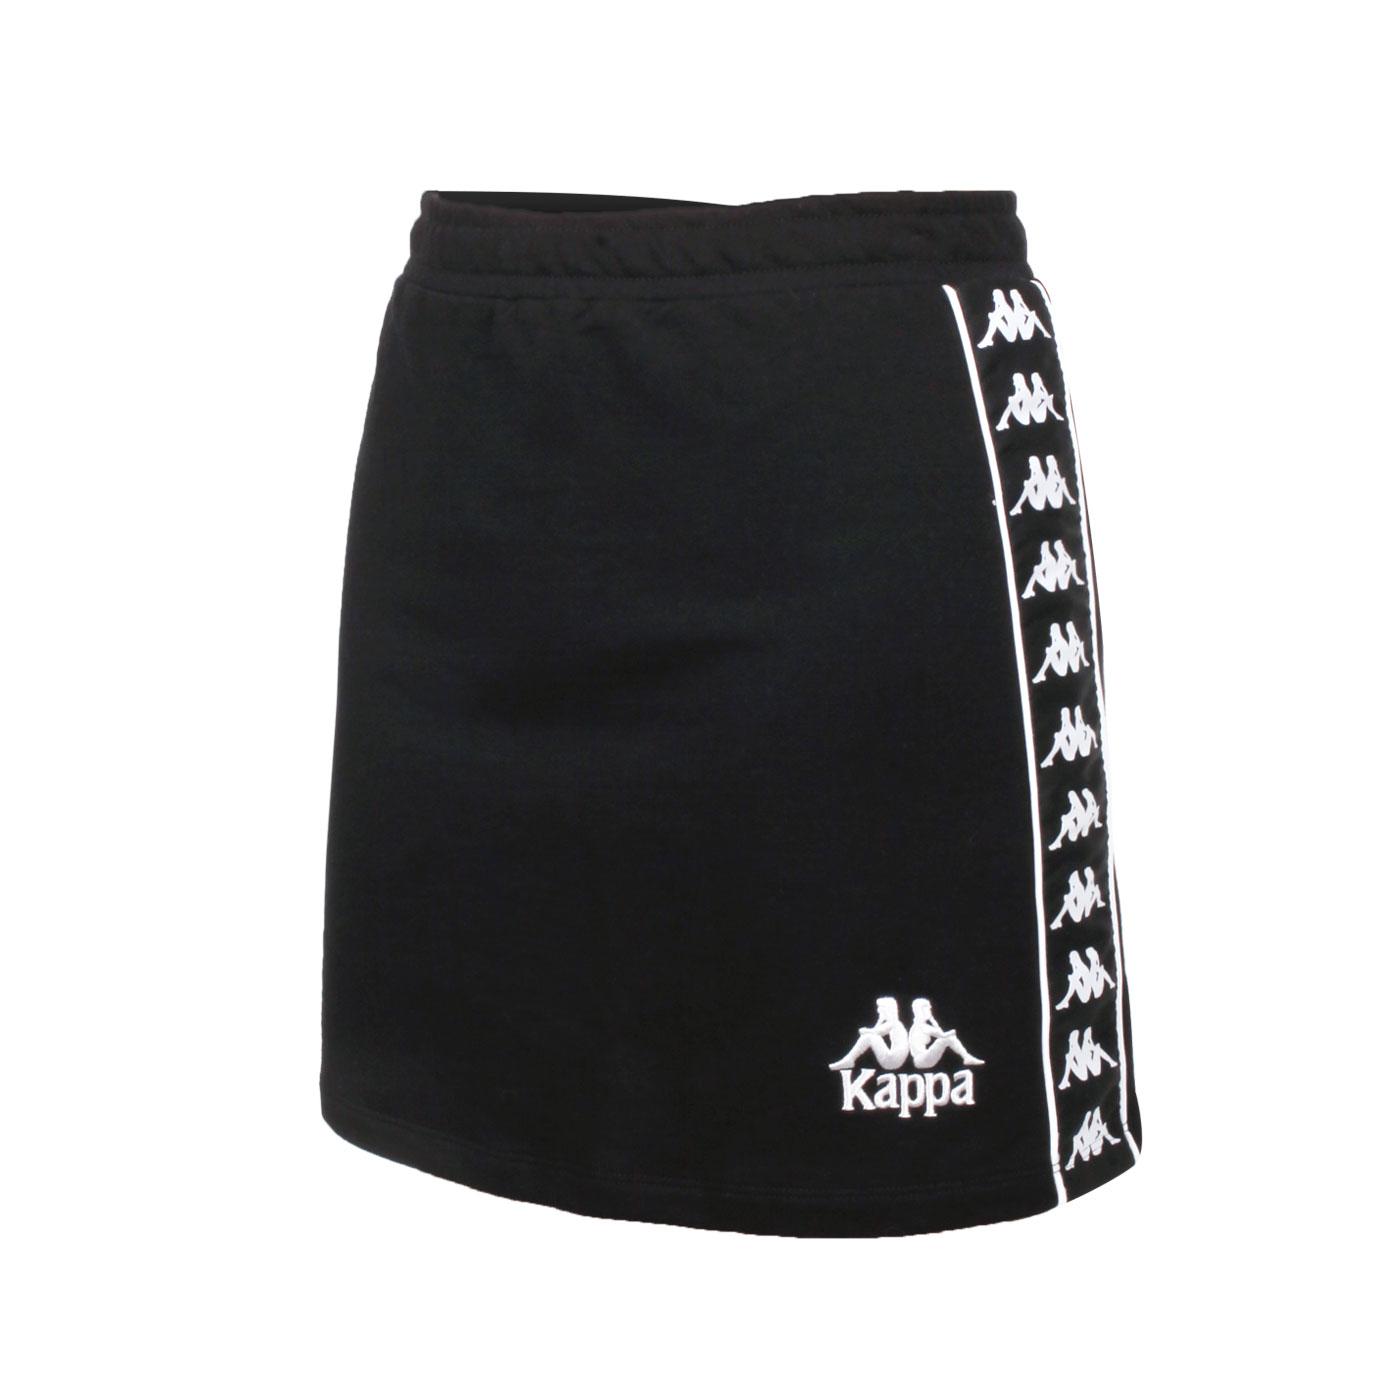 KAPPA 女款短裙 35154YW-005 - 黑白